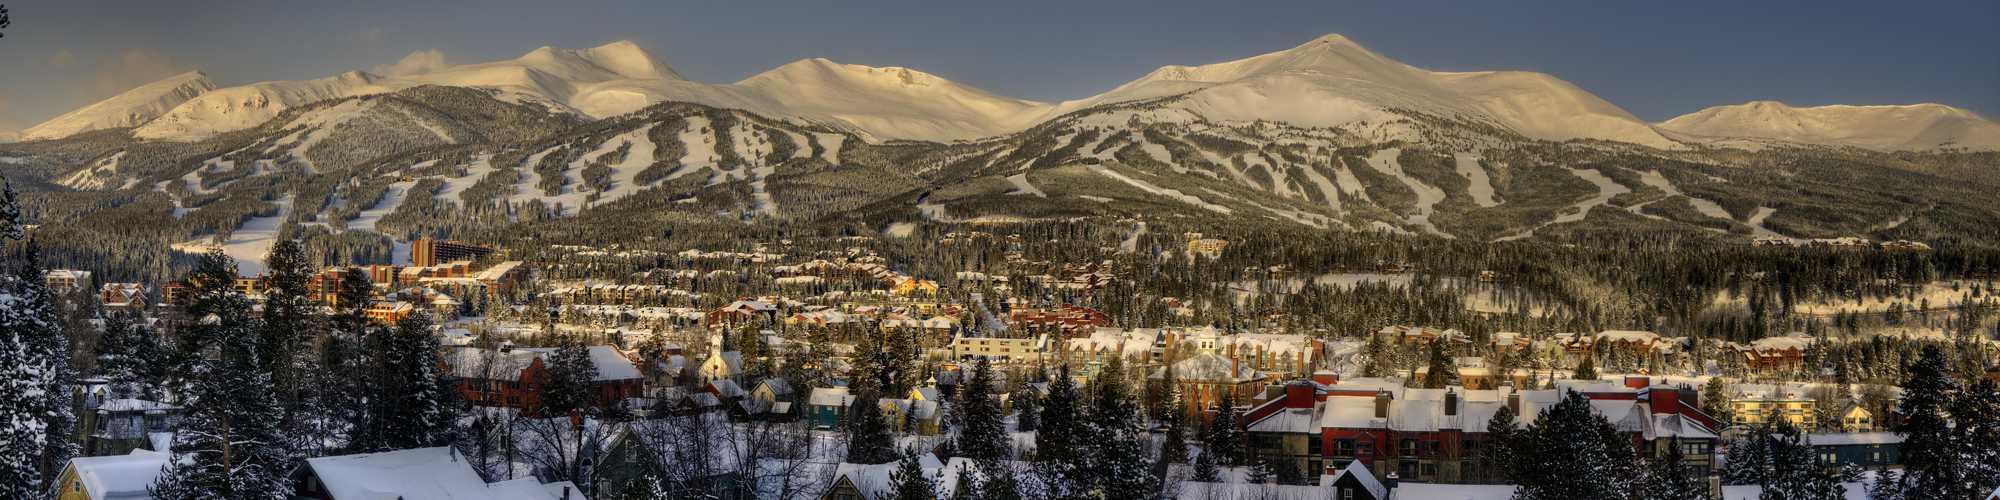 Snowy town of Breckenridge